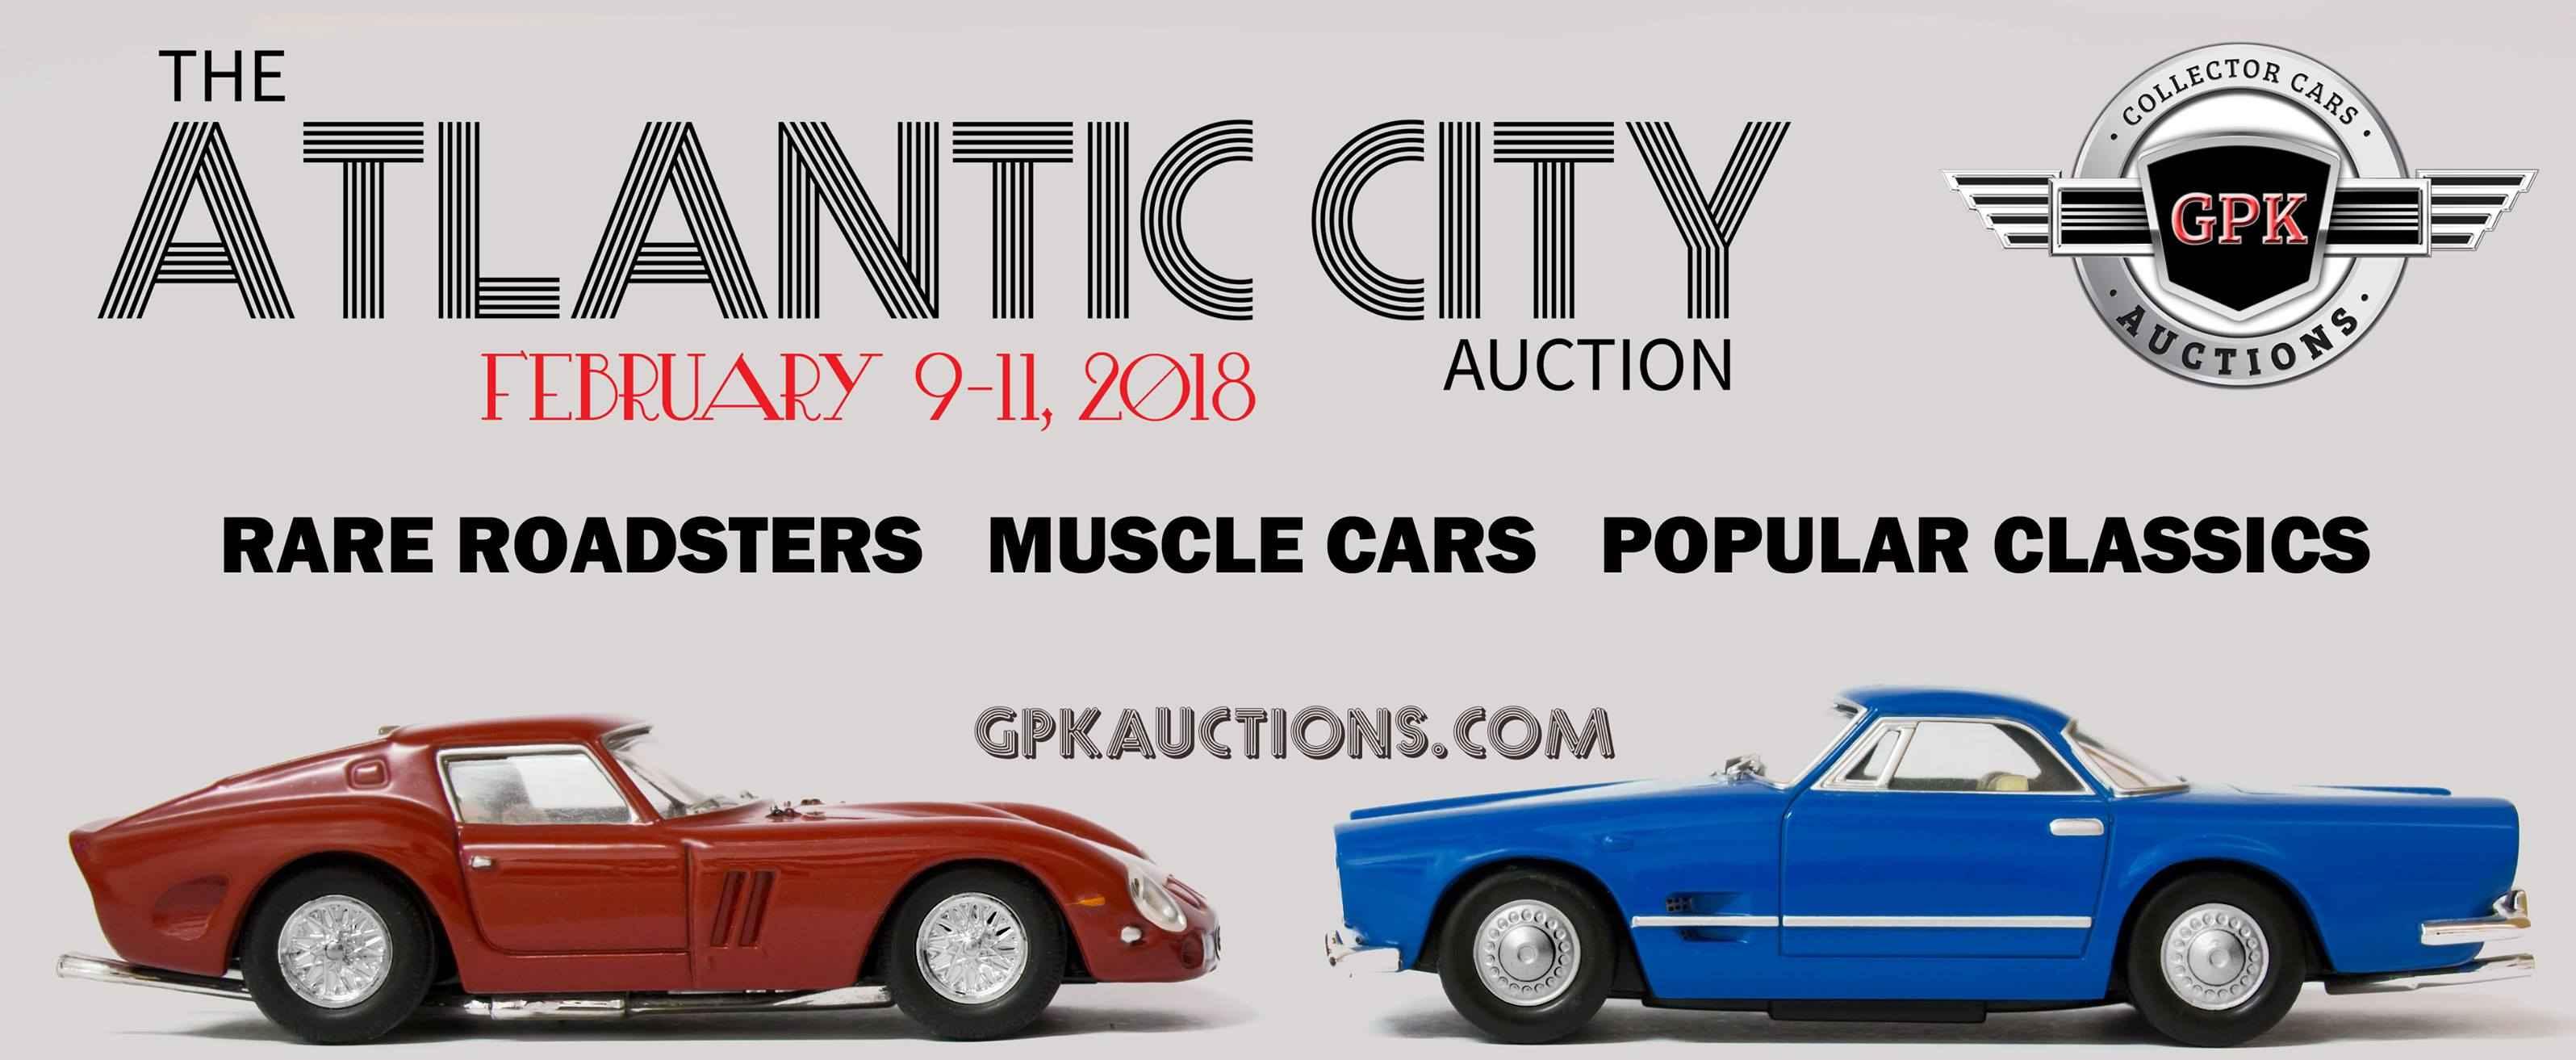 atlantic city classic car show shoretv new jersey watch it live it love it. Black Bedroom Furniture Sets. Home Design Ideas